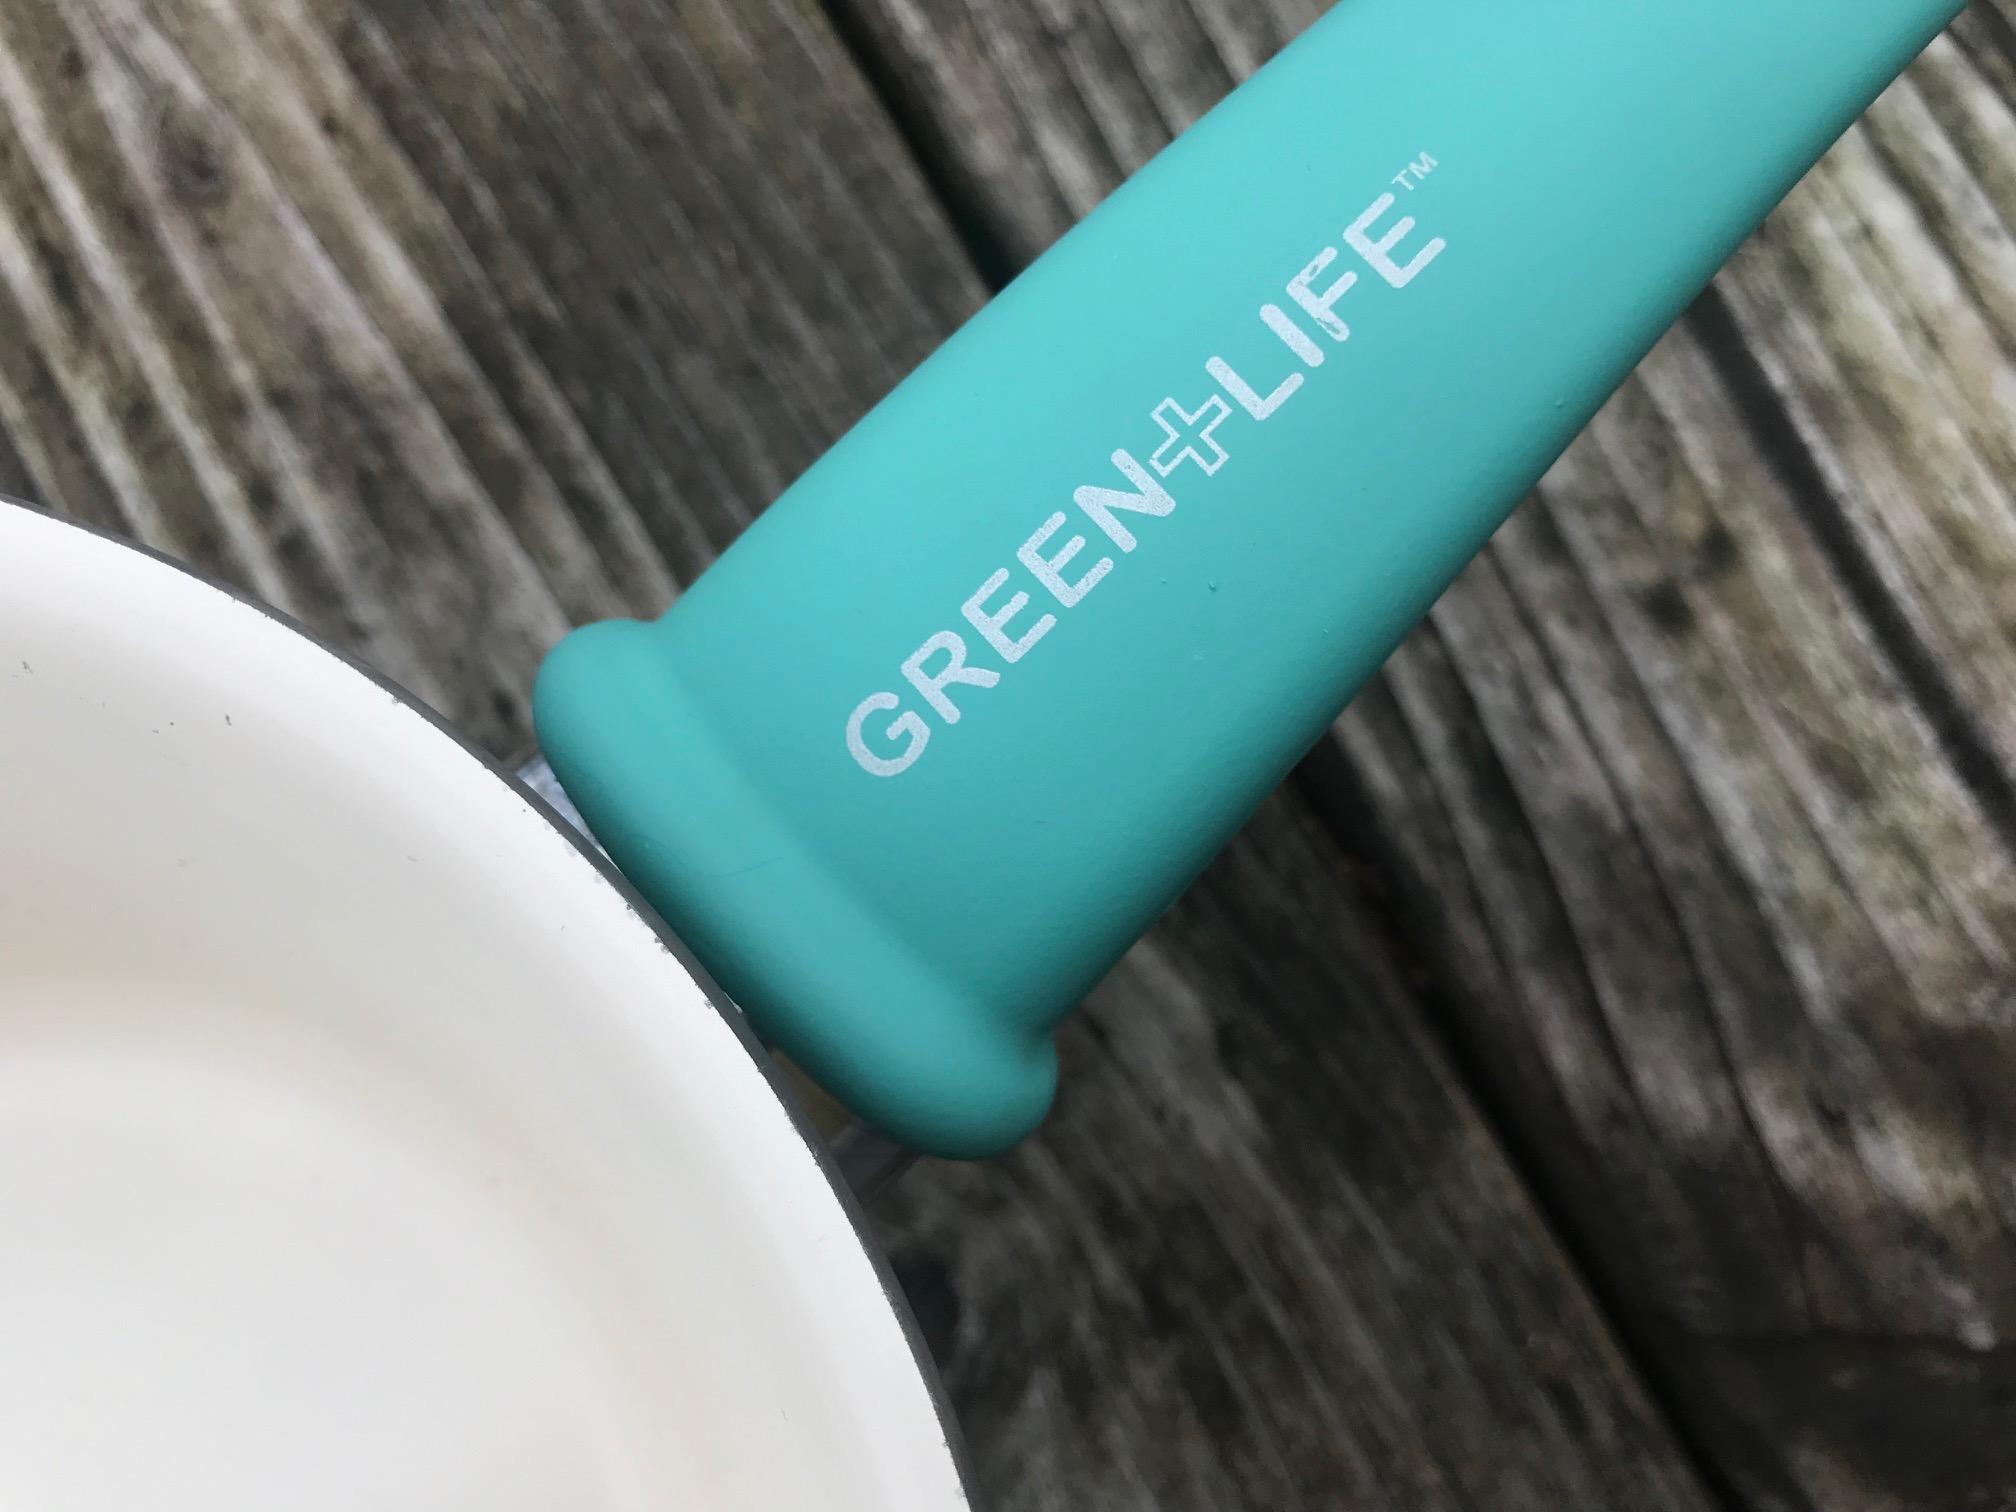 Green+Life Saucepan: Lead Free, but....